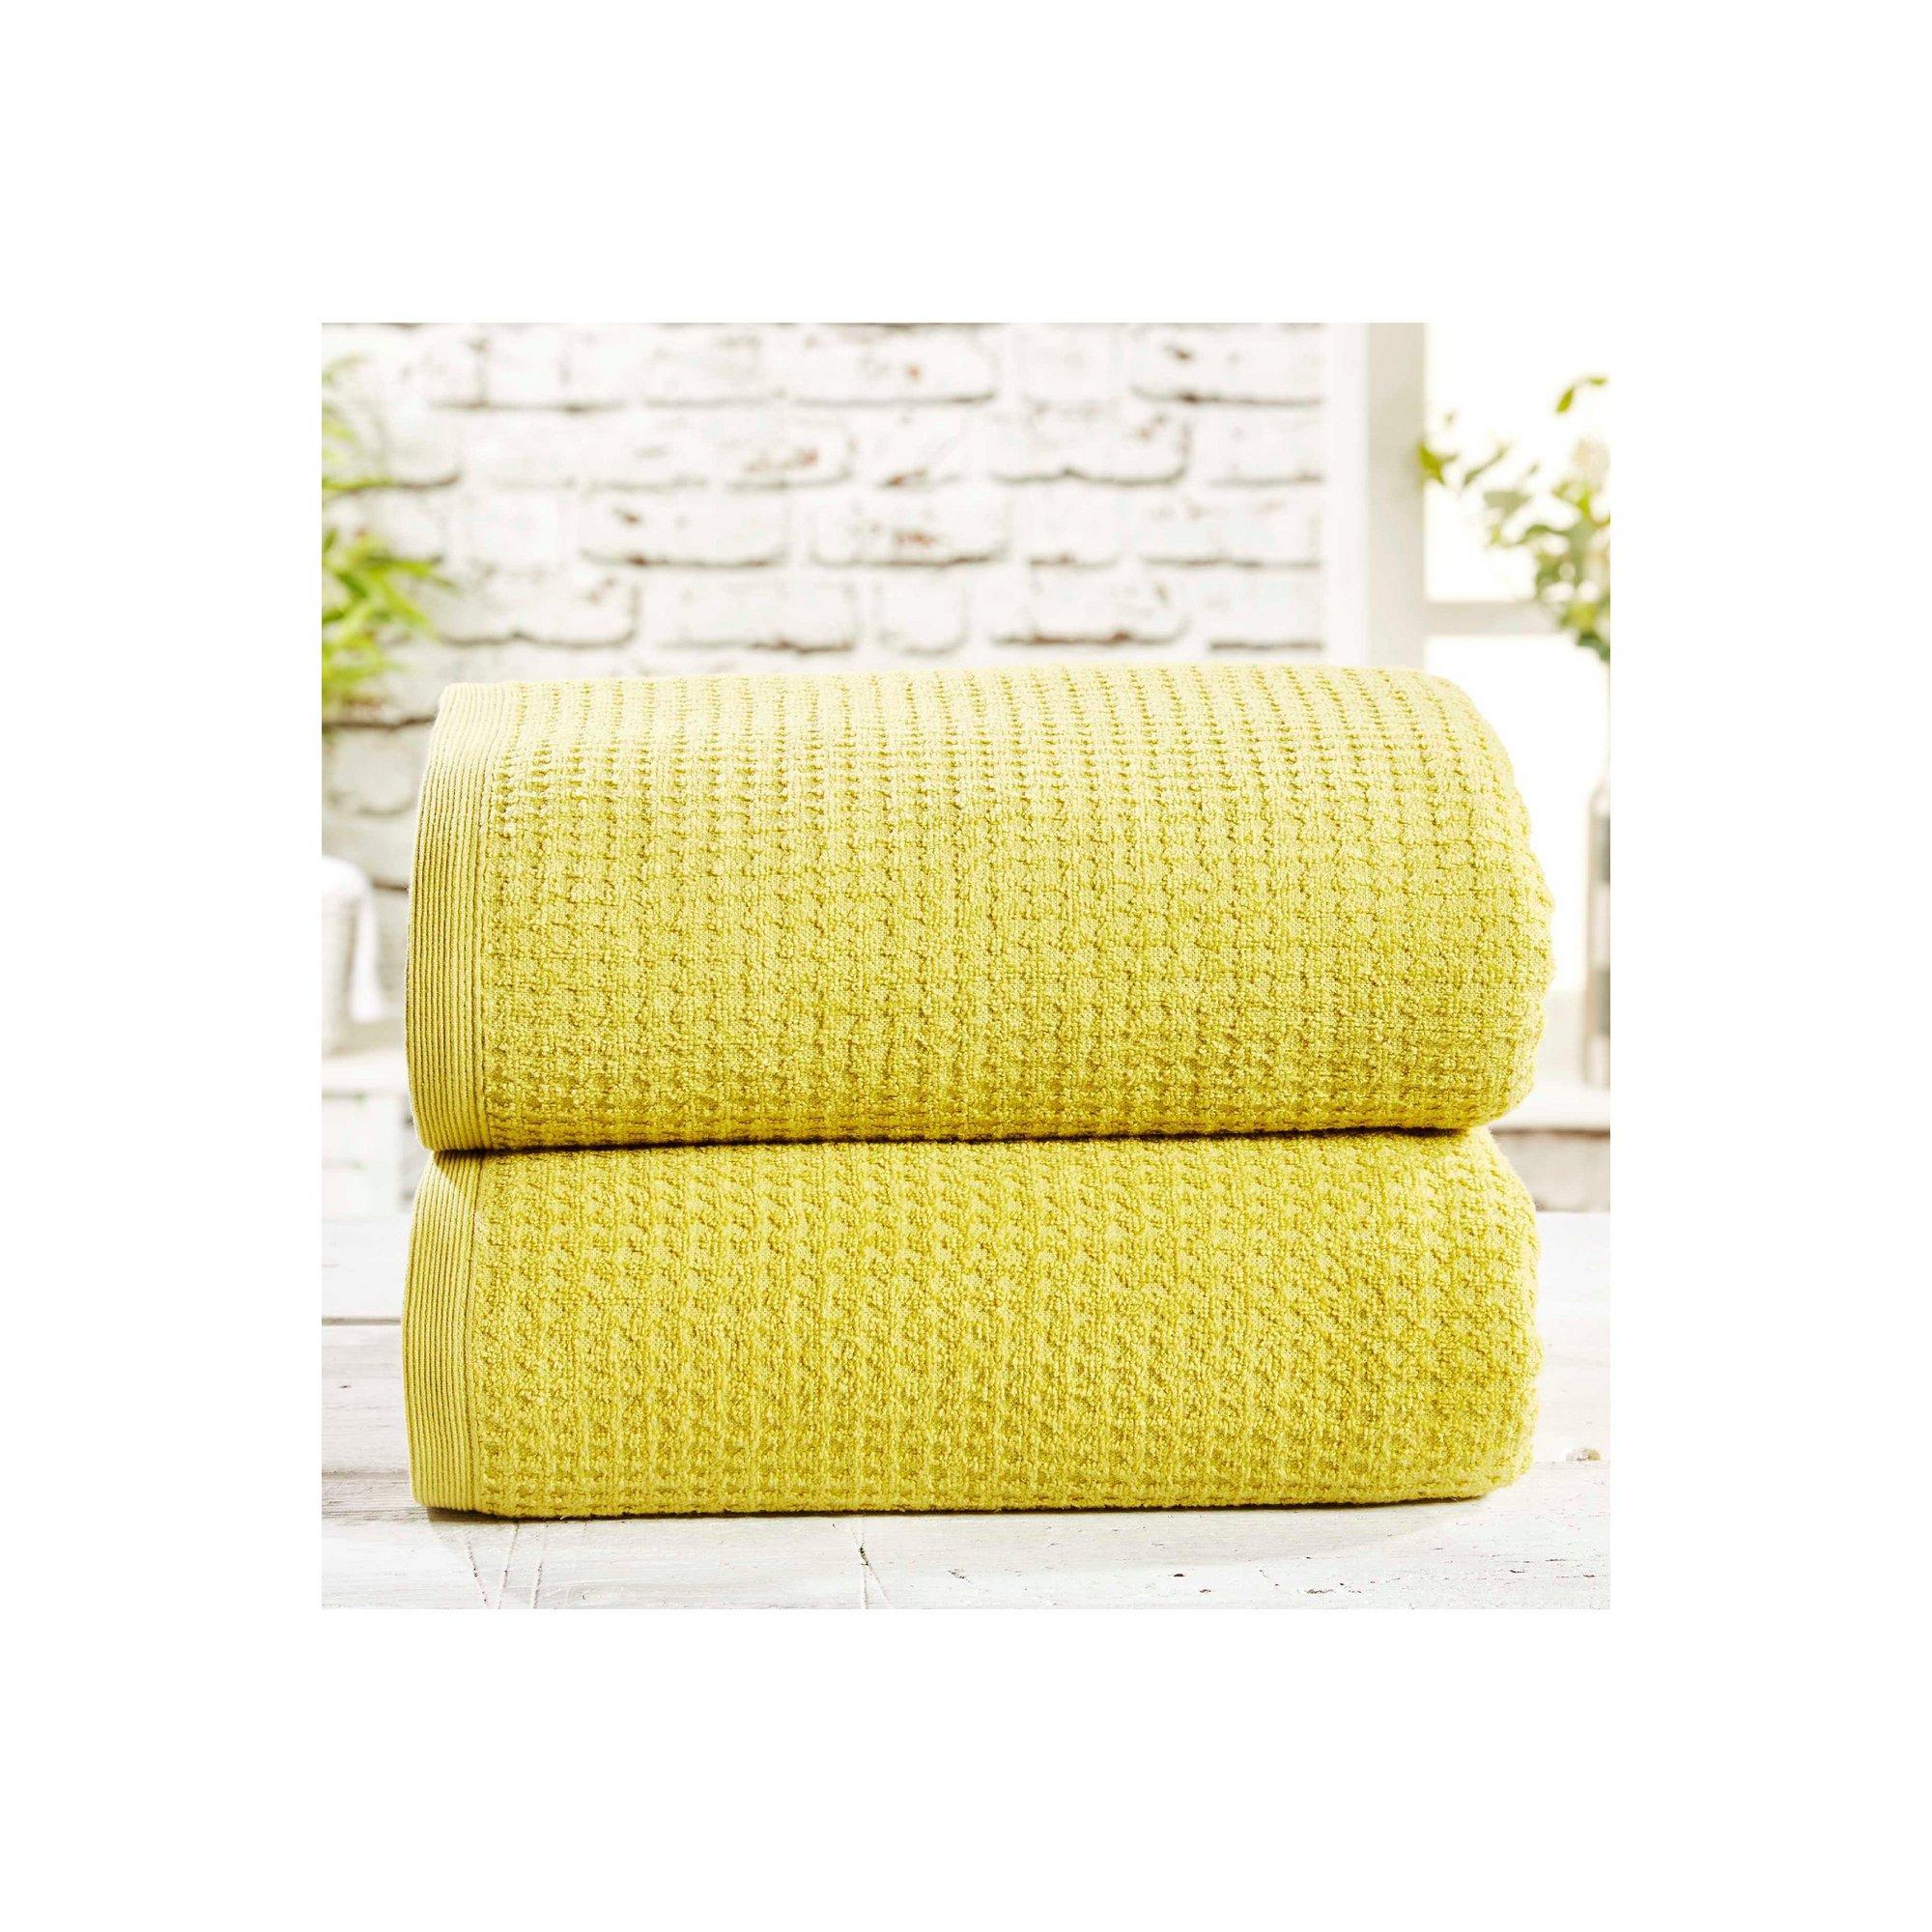 Image of 2 Piece Waffle Jumbo Towels